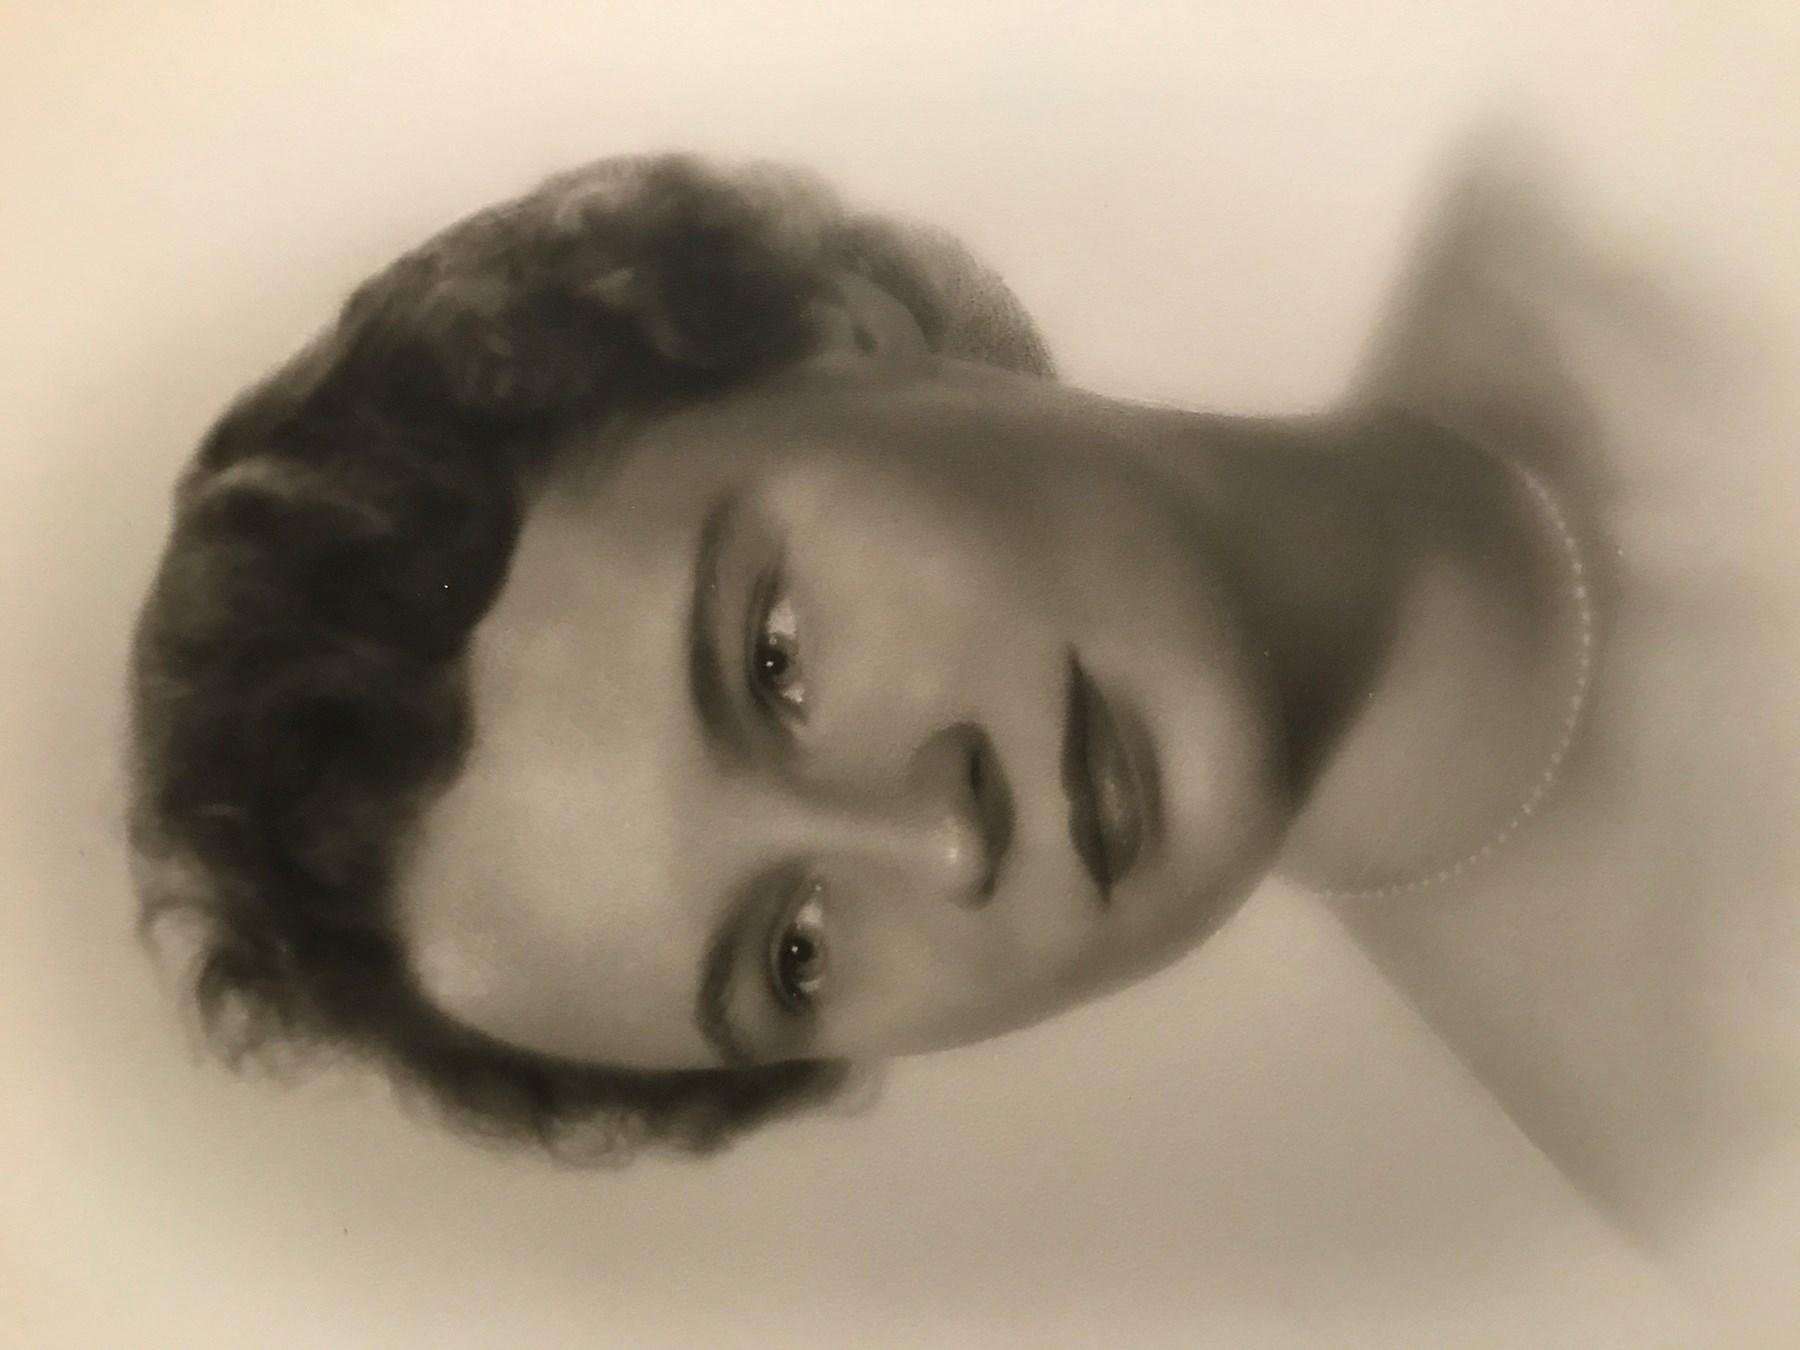 Zehra Naqvi,Kate Beahan Sex pic Bob Hope (1903?003 (naturalized American citizen),Lydia Hearst